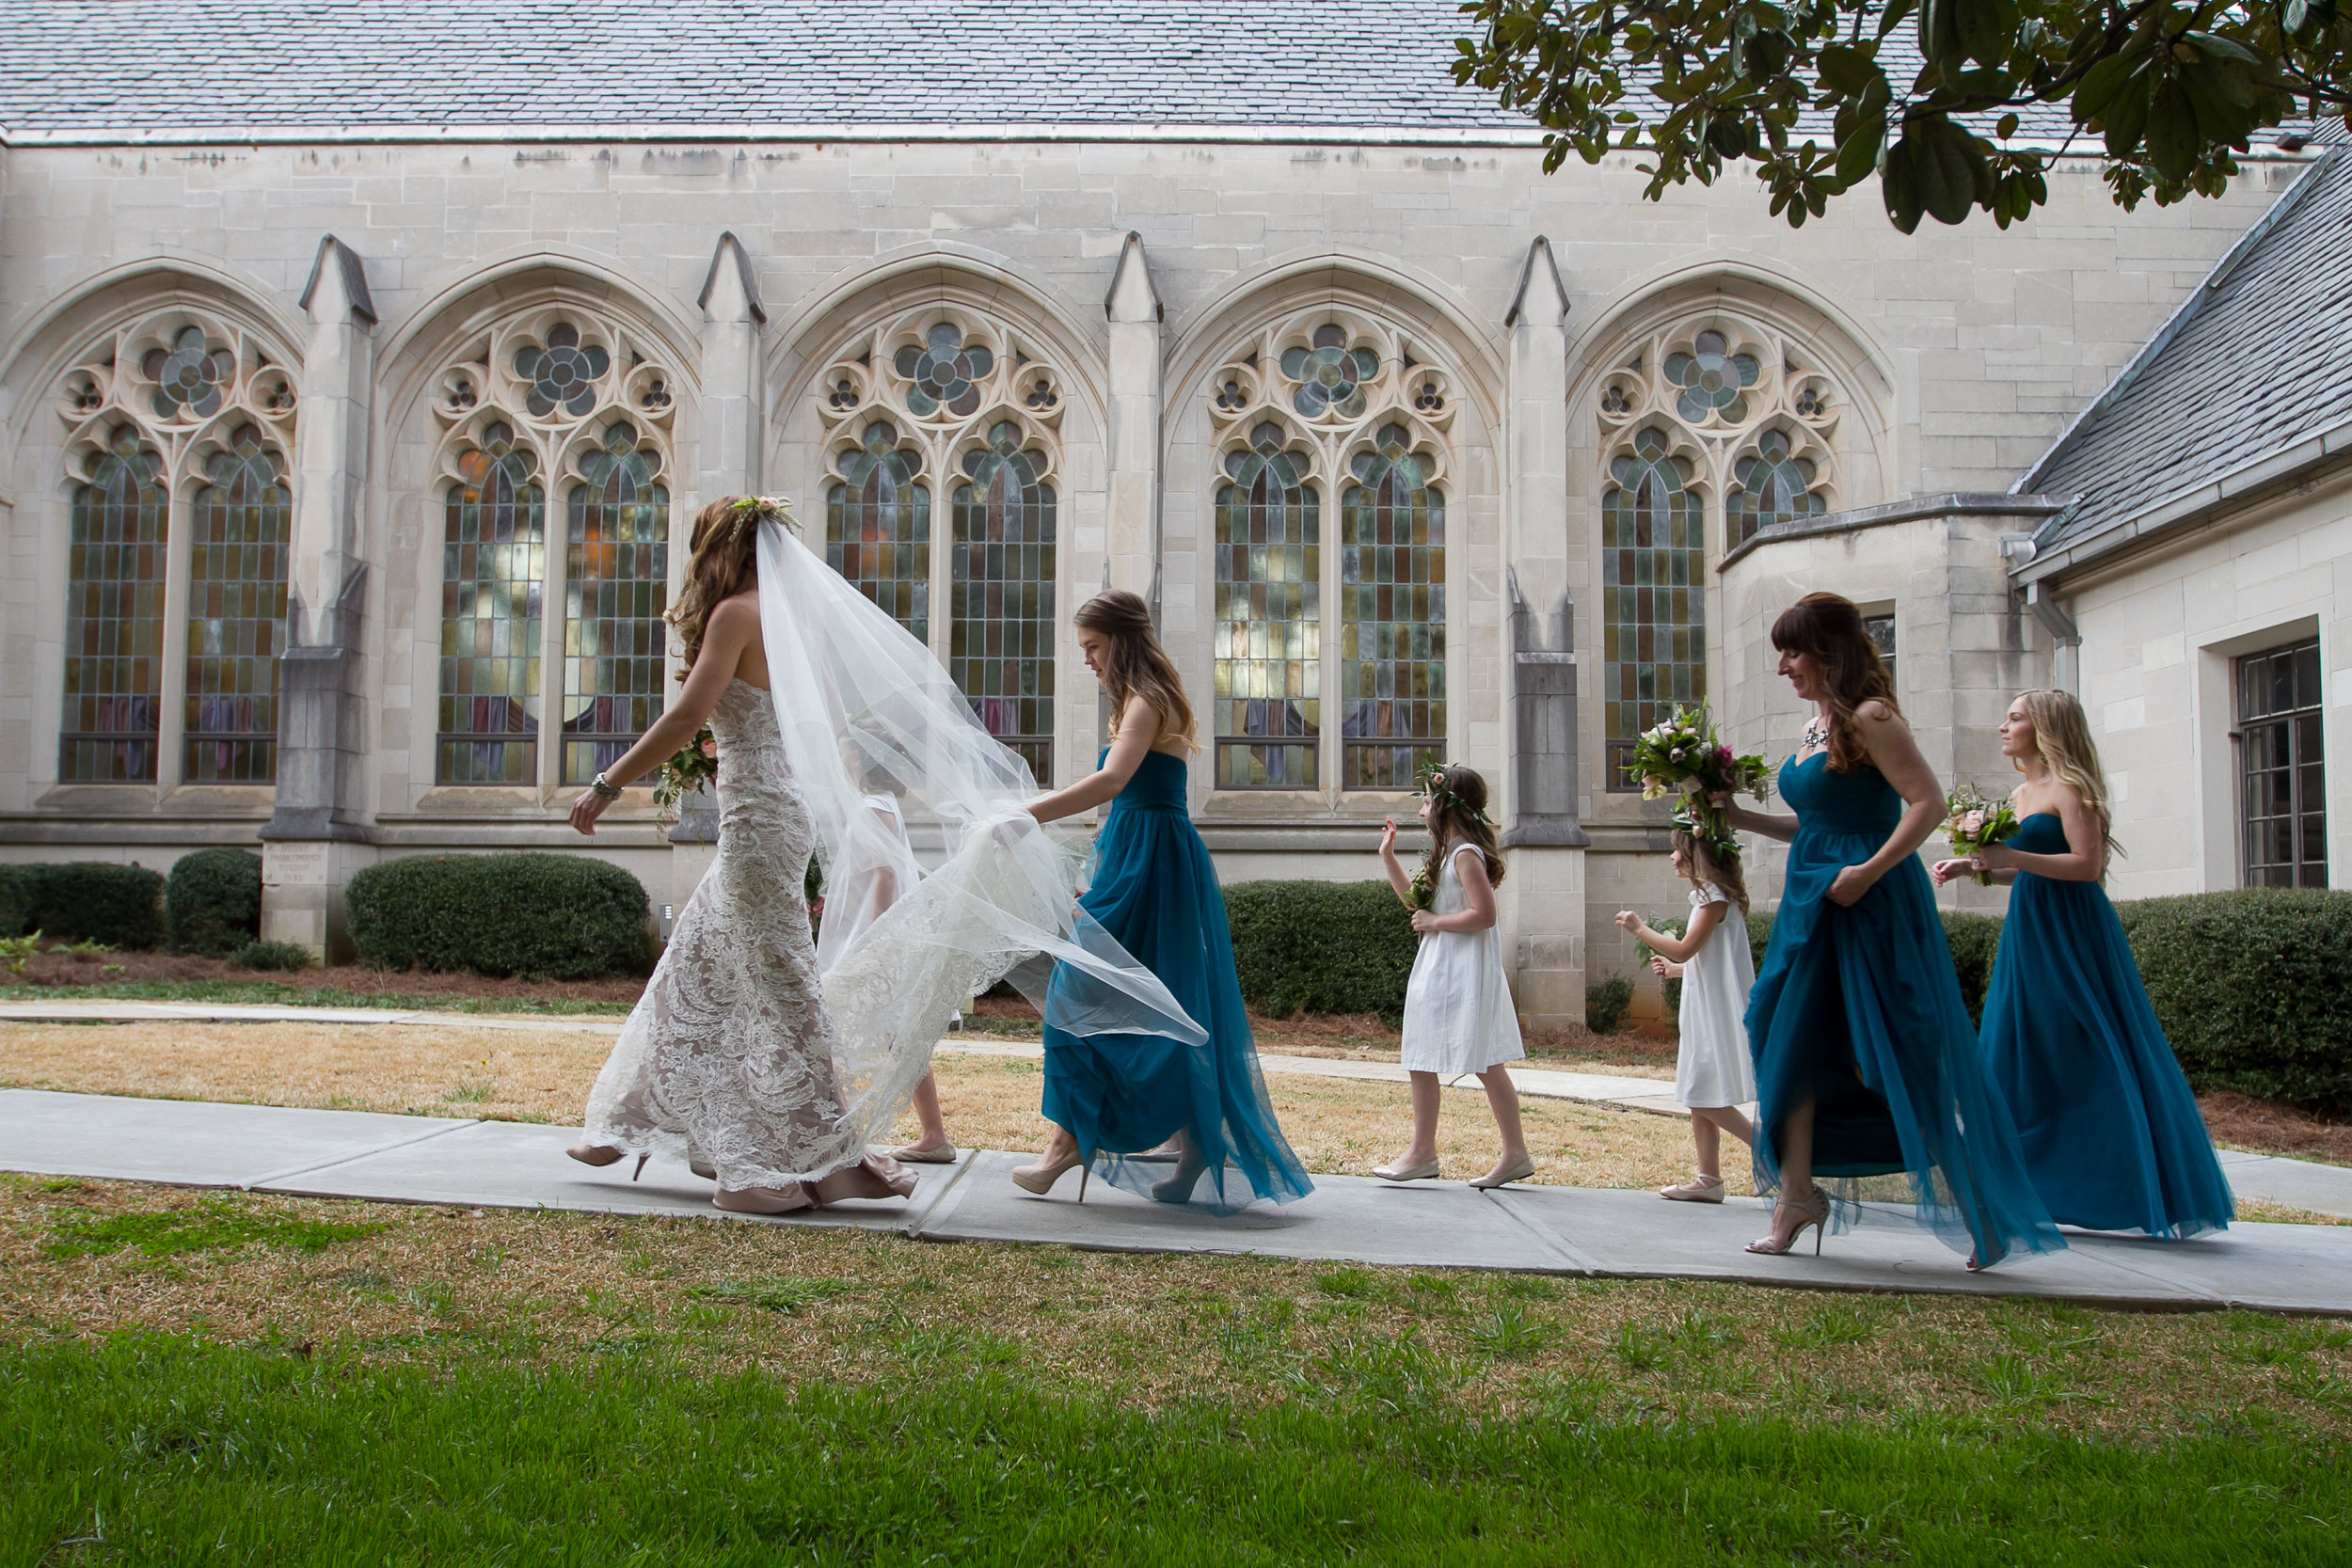 Tim and Vanessa Wedding at Emory Presbyterian Church and Trolley Barn